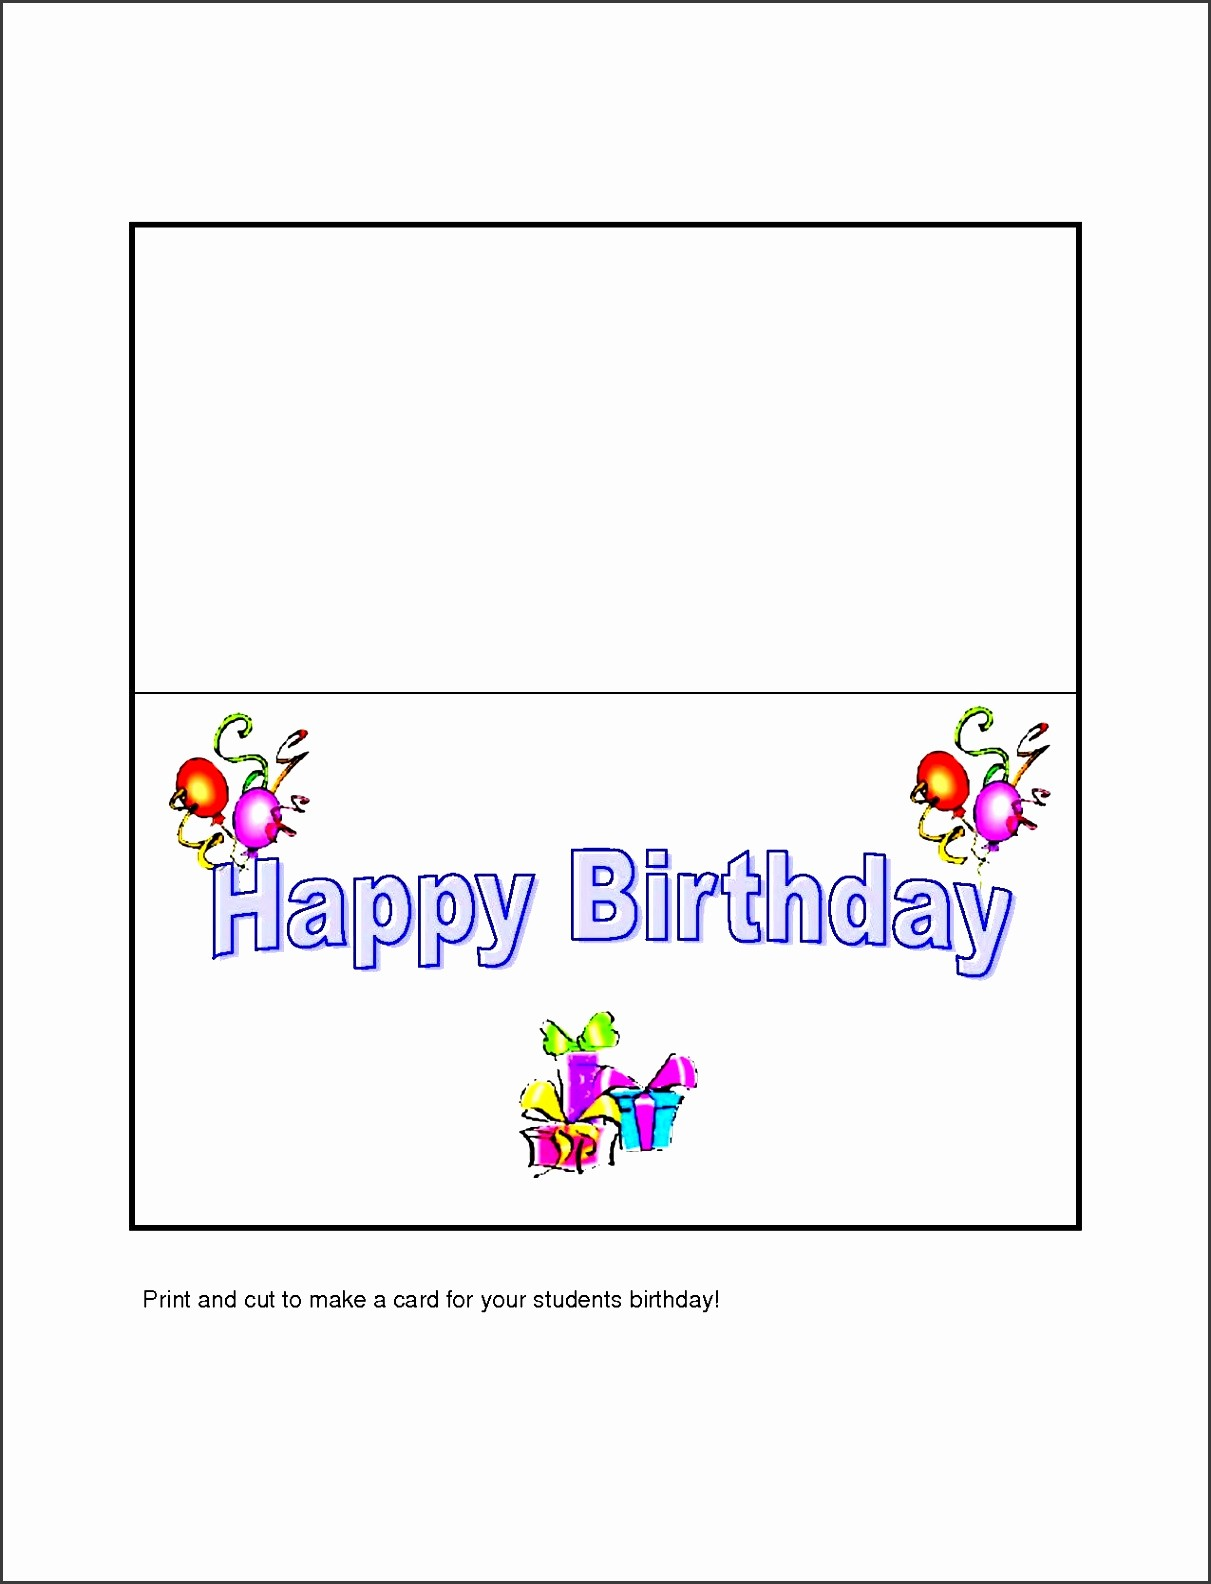 Microsoft Word Christmas Card Templates Inspirational 10 Free Microsoft Word Greeting Card Templates